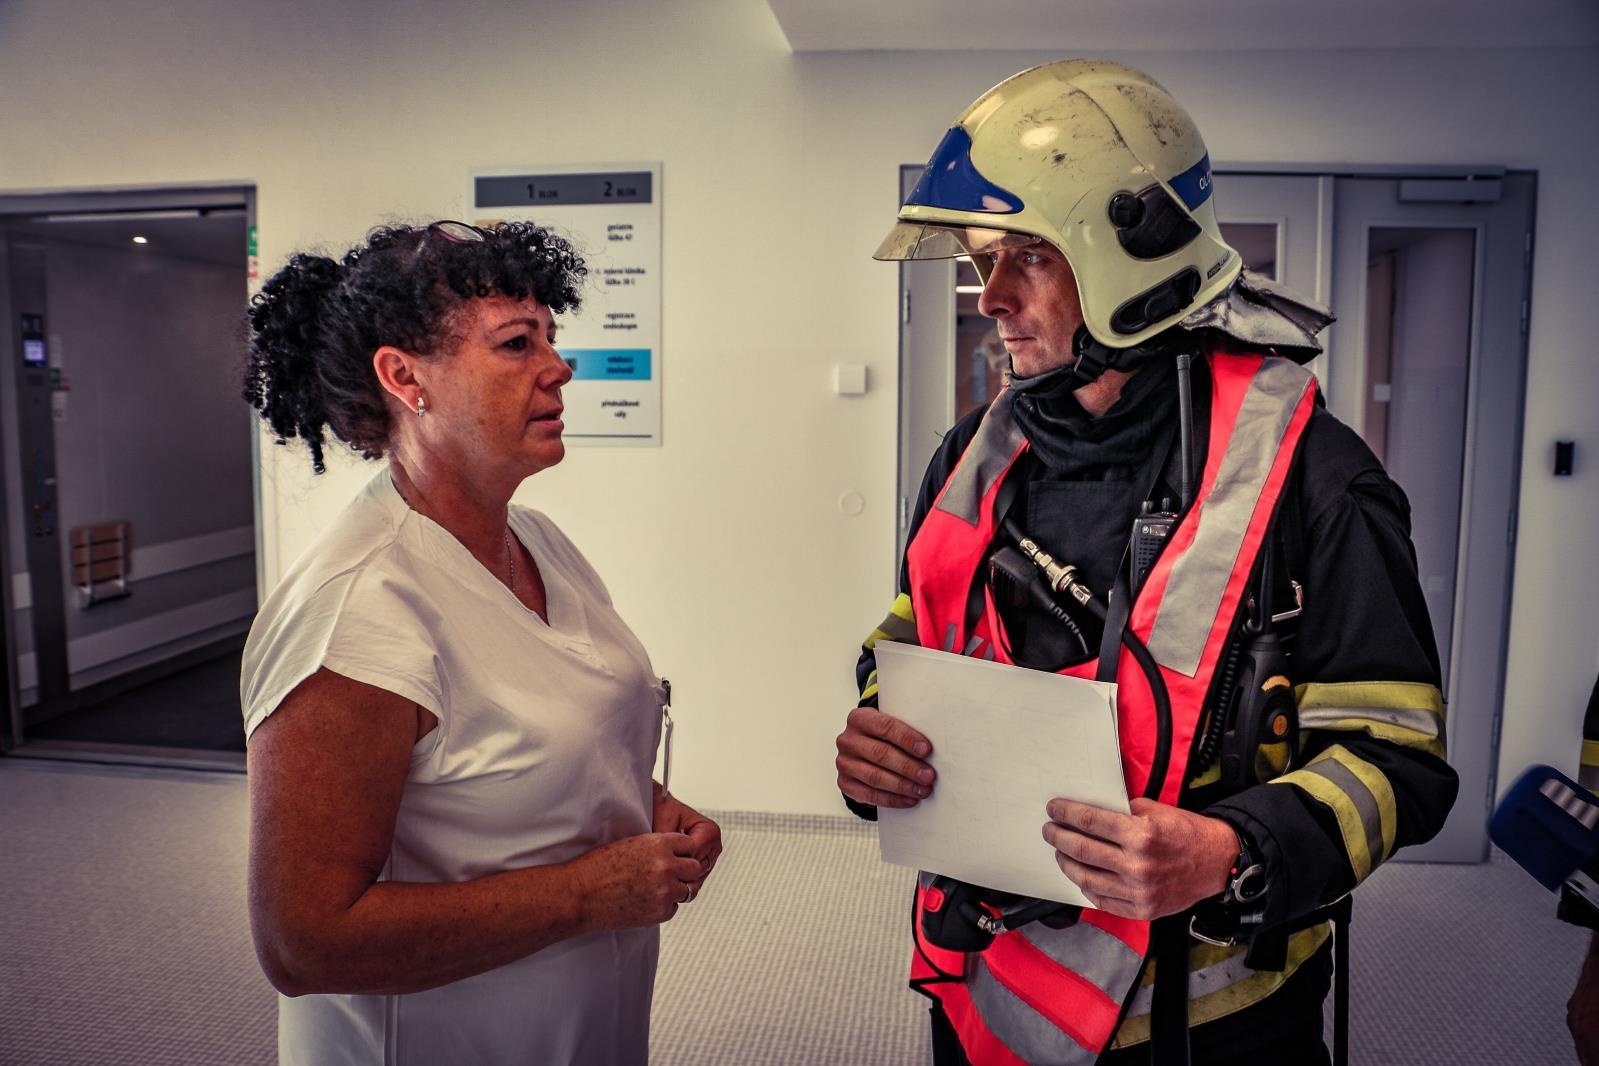 FN Olomouc - Evakuace 2018 zdroj foto: HZS OLK